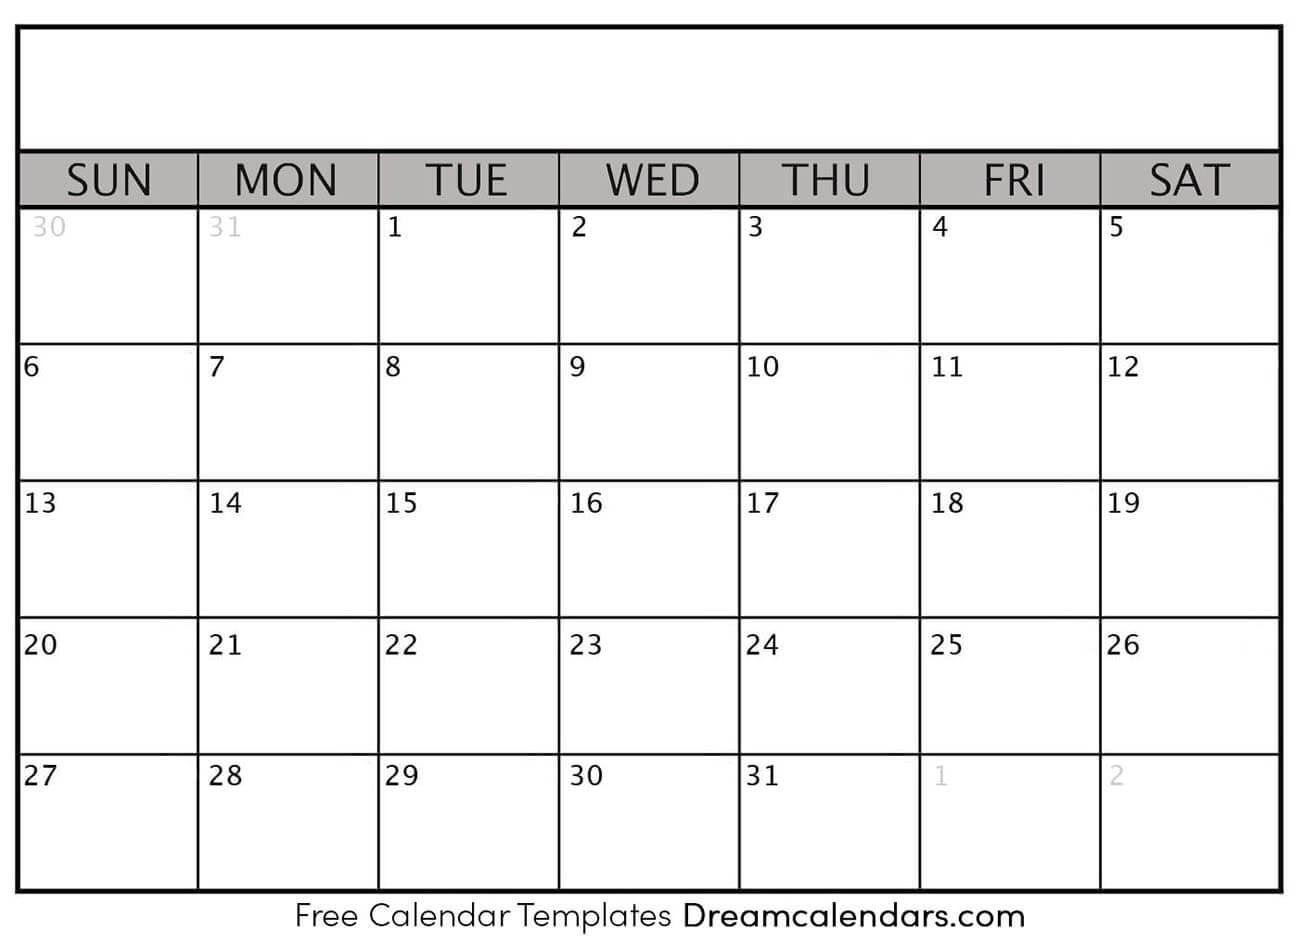 Printable Blank Calendar - Dream Calendars with regard to Free Printable Blank Calendar Templates